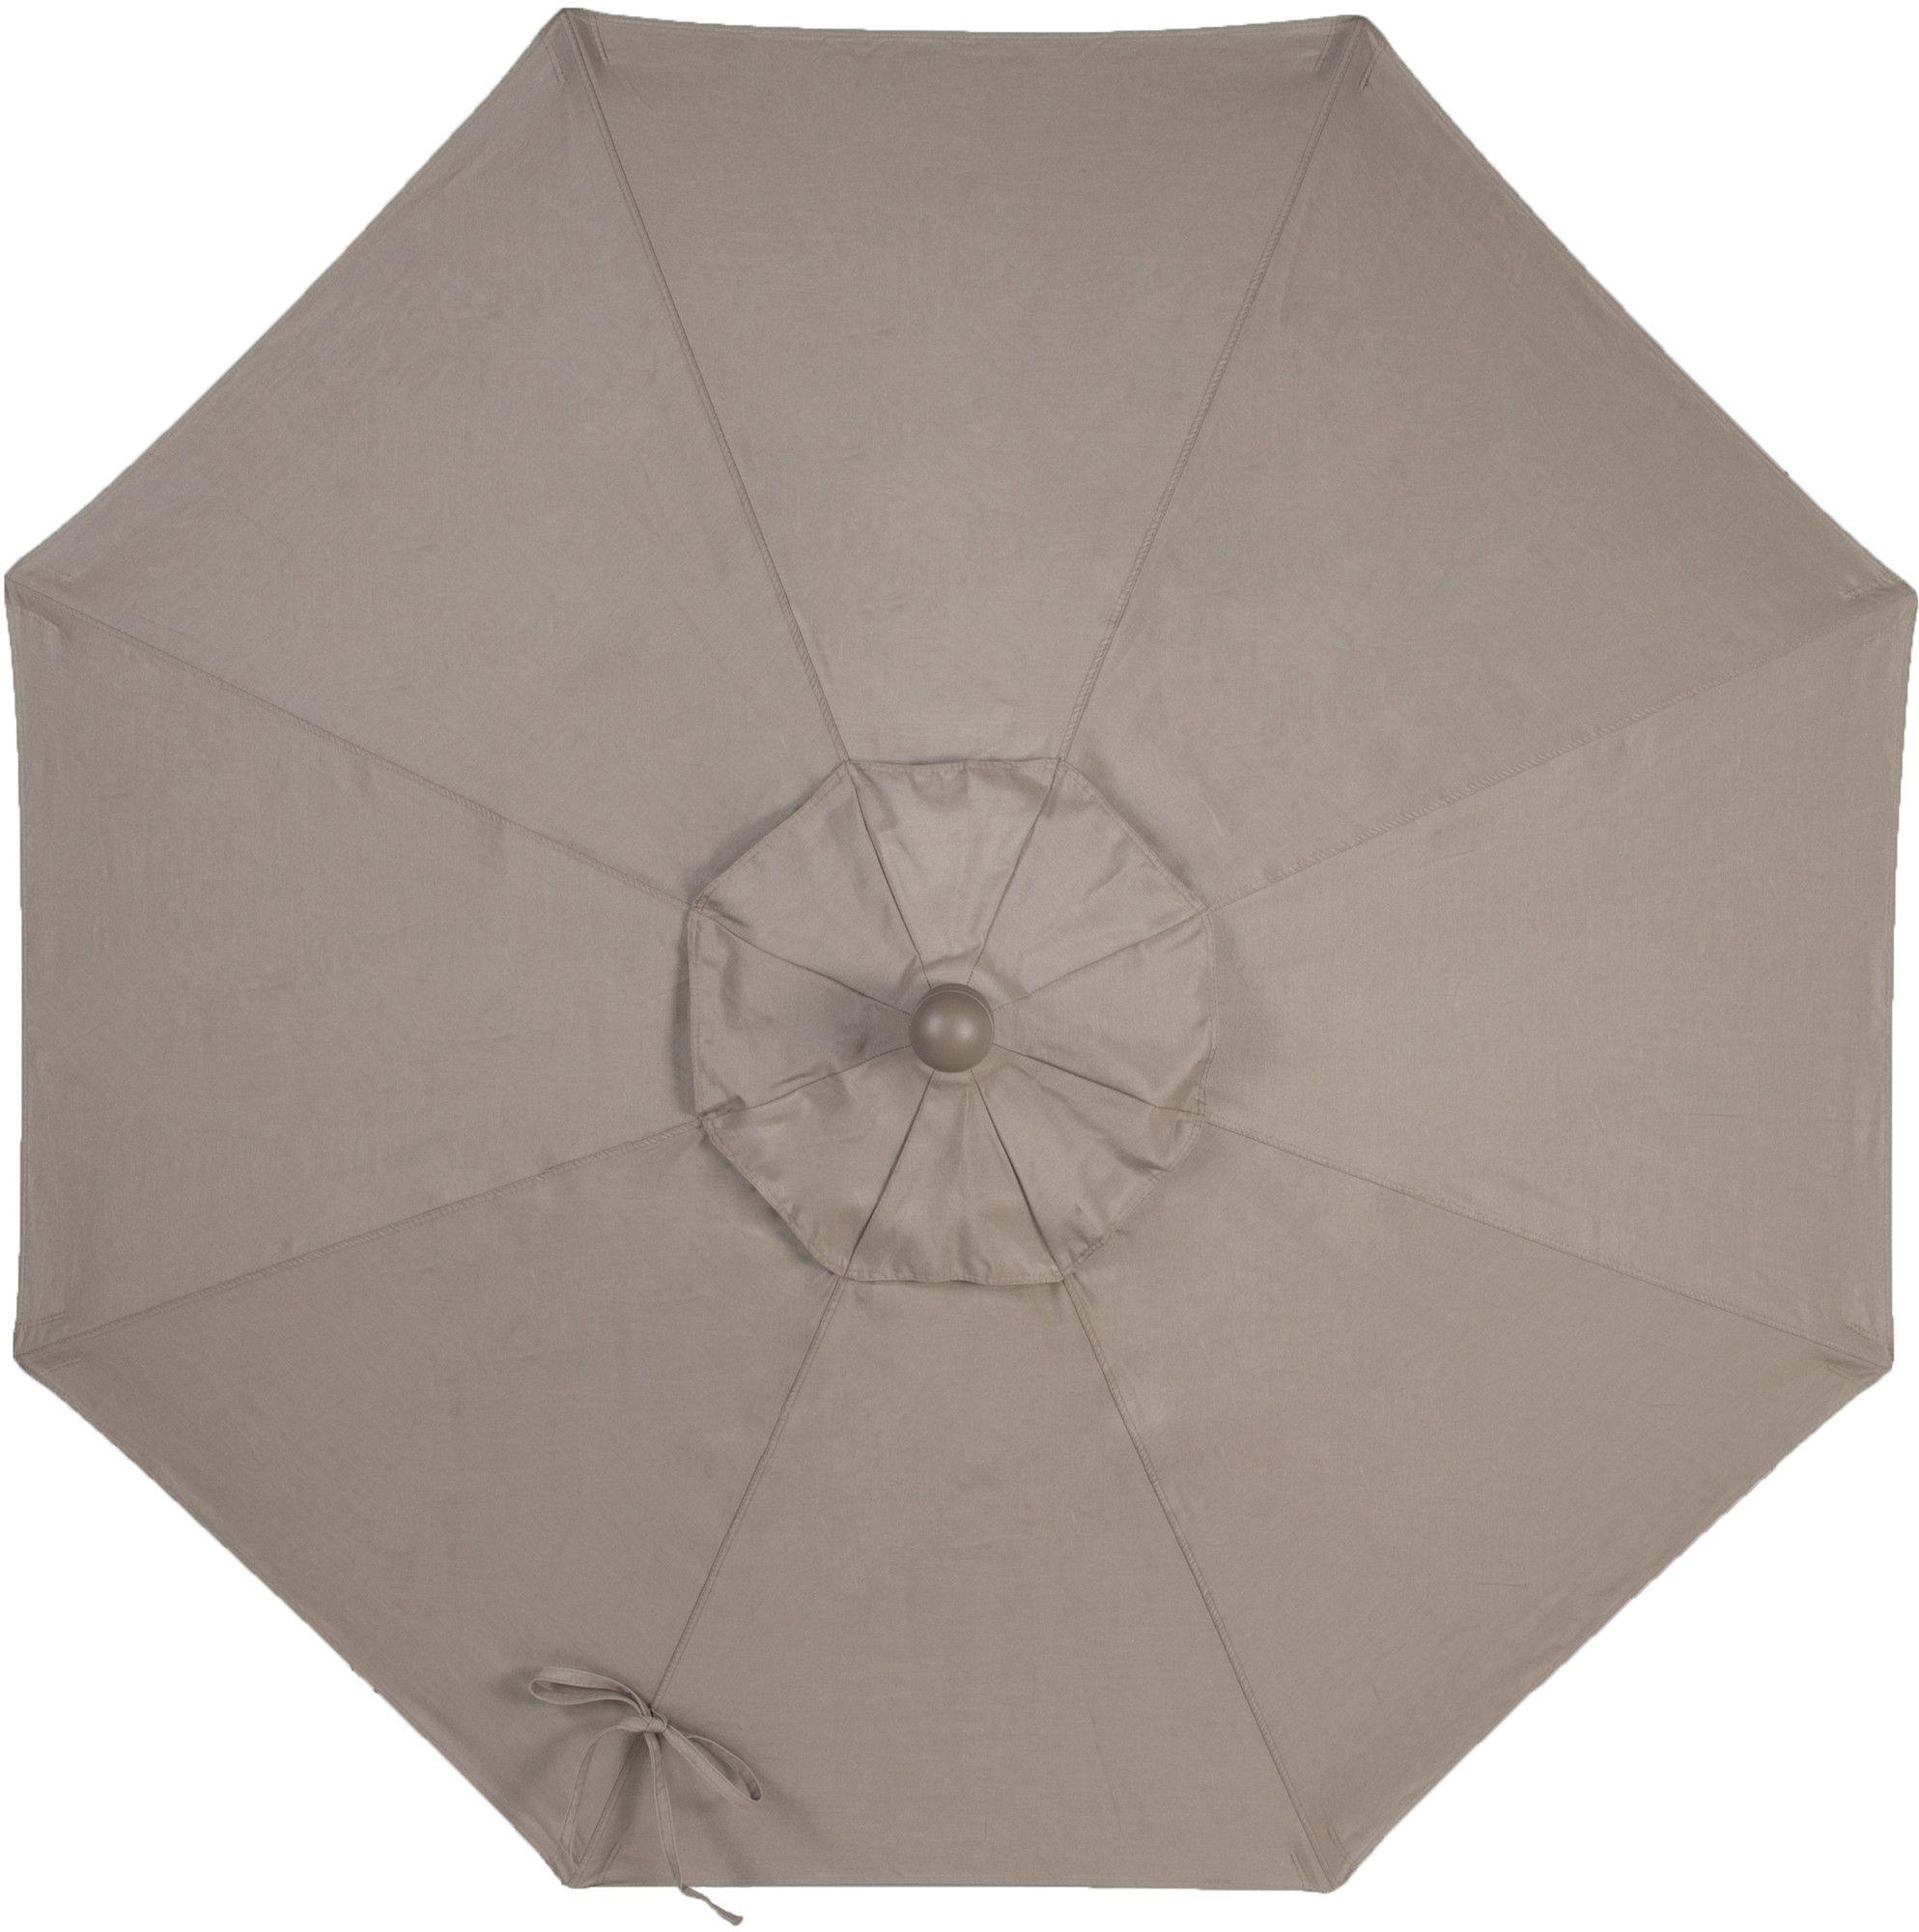 9 Sunbrella Replacement Canopy For Market Umbrella